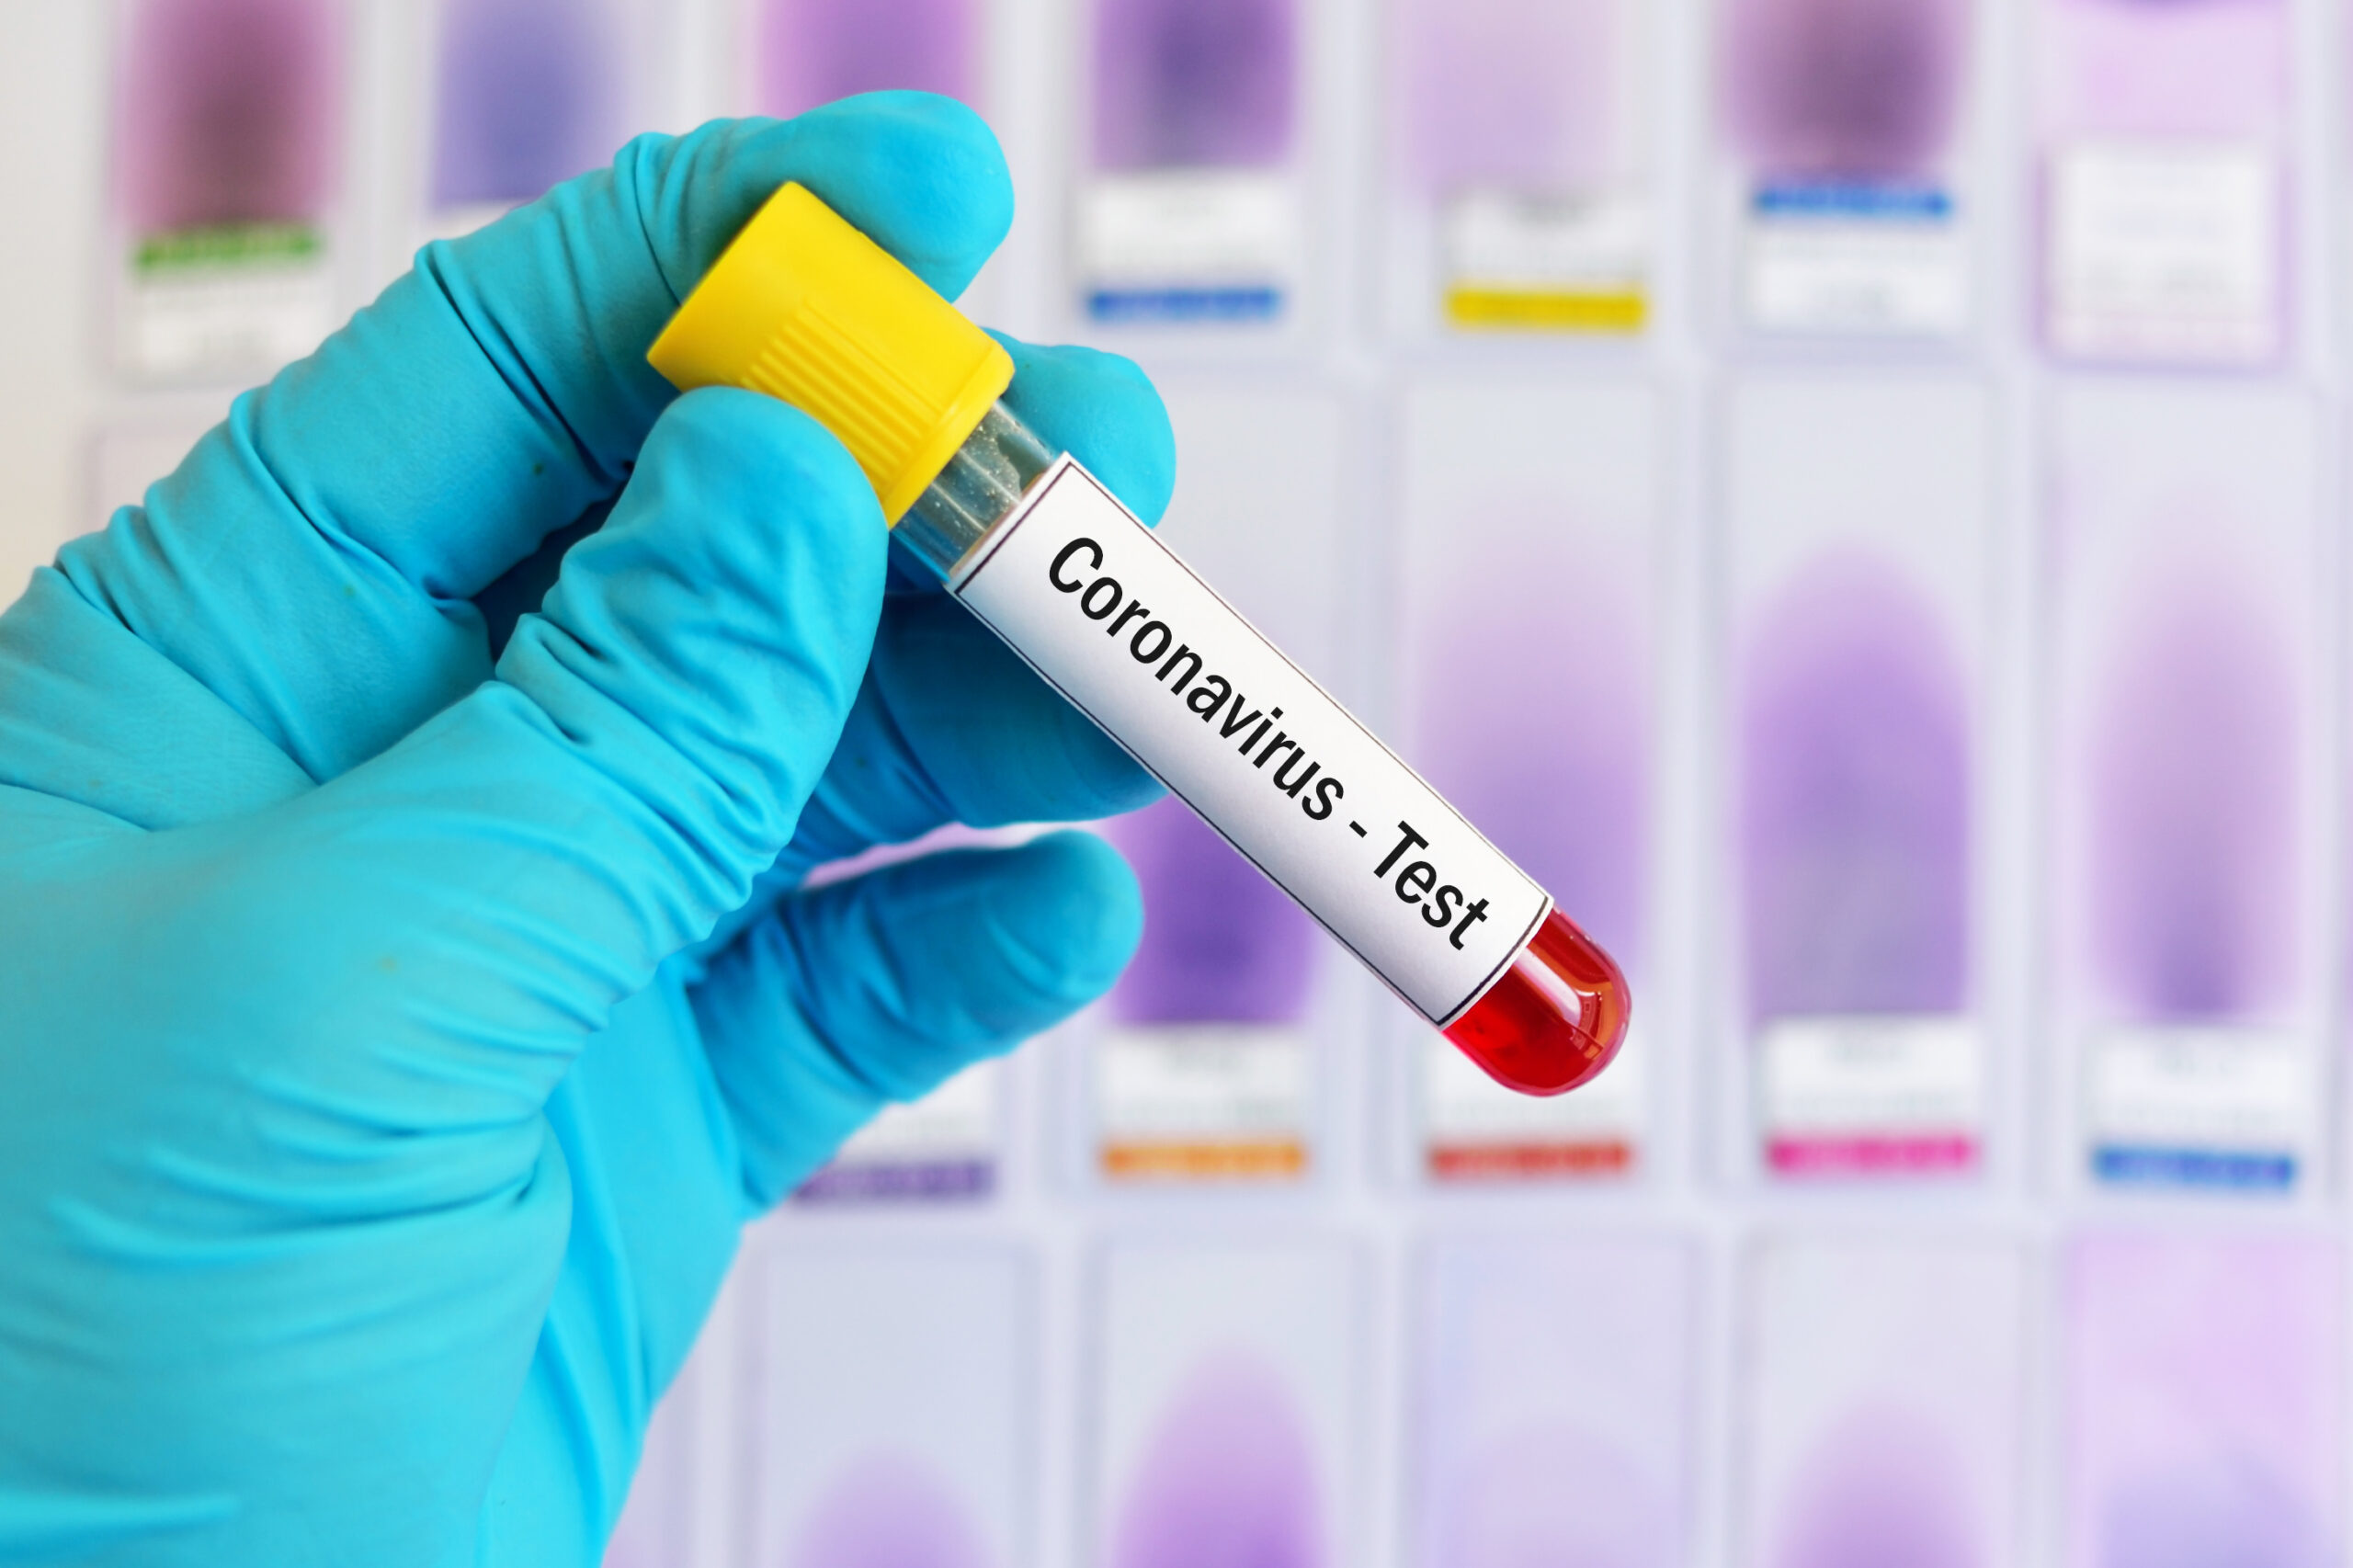 Image of sample for coronavirus test. Image credit: iStock